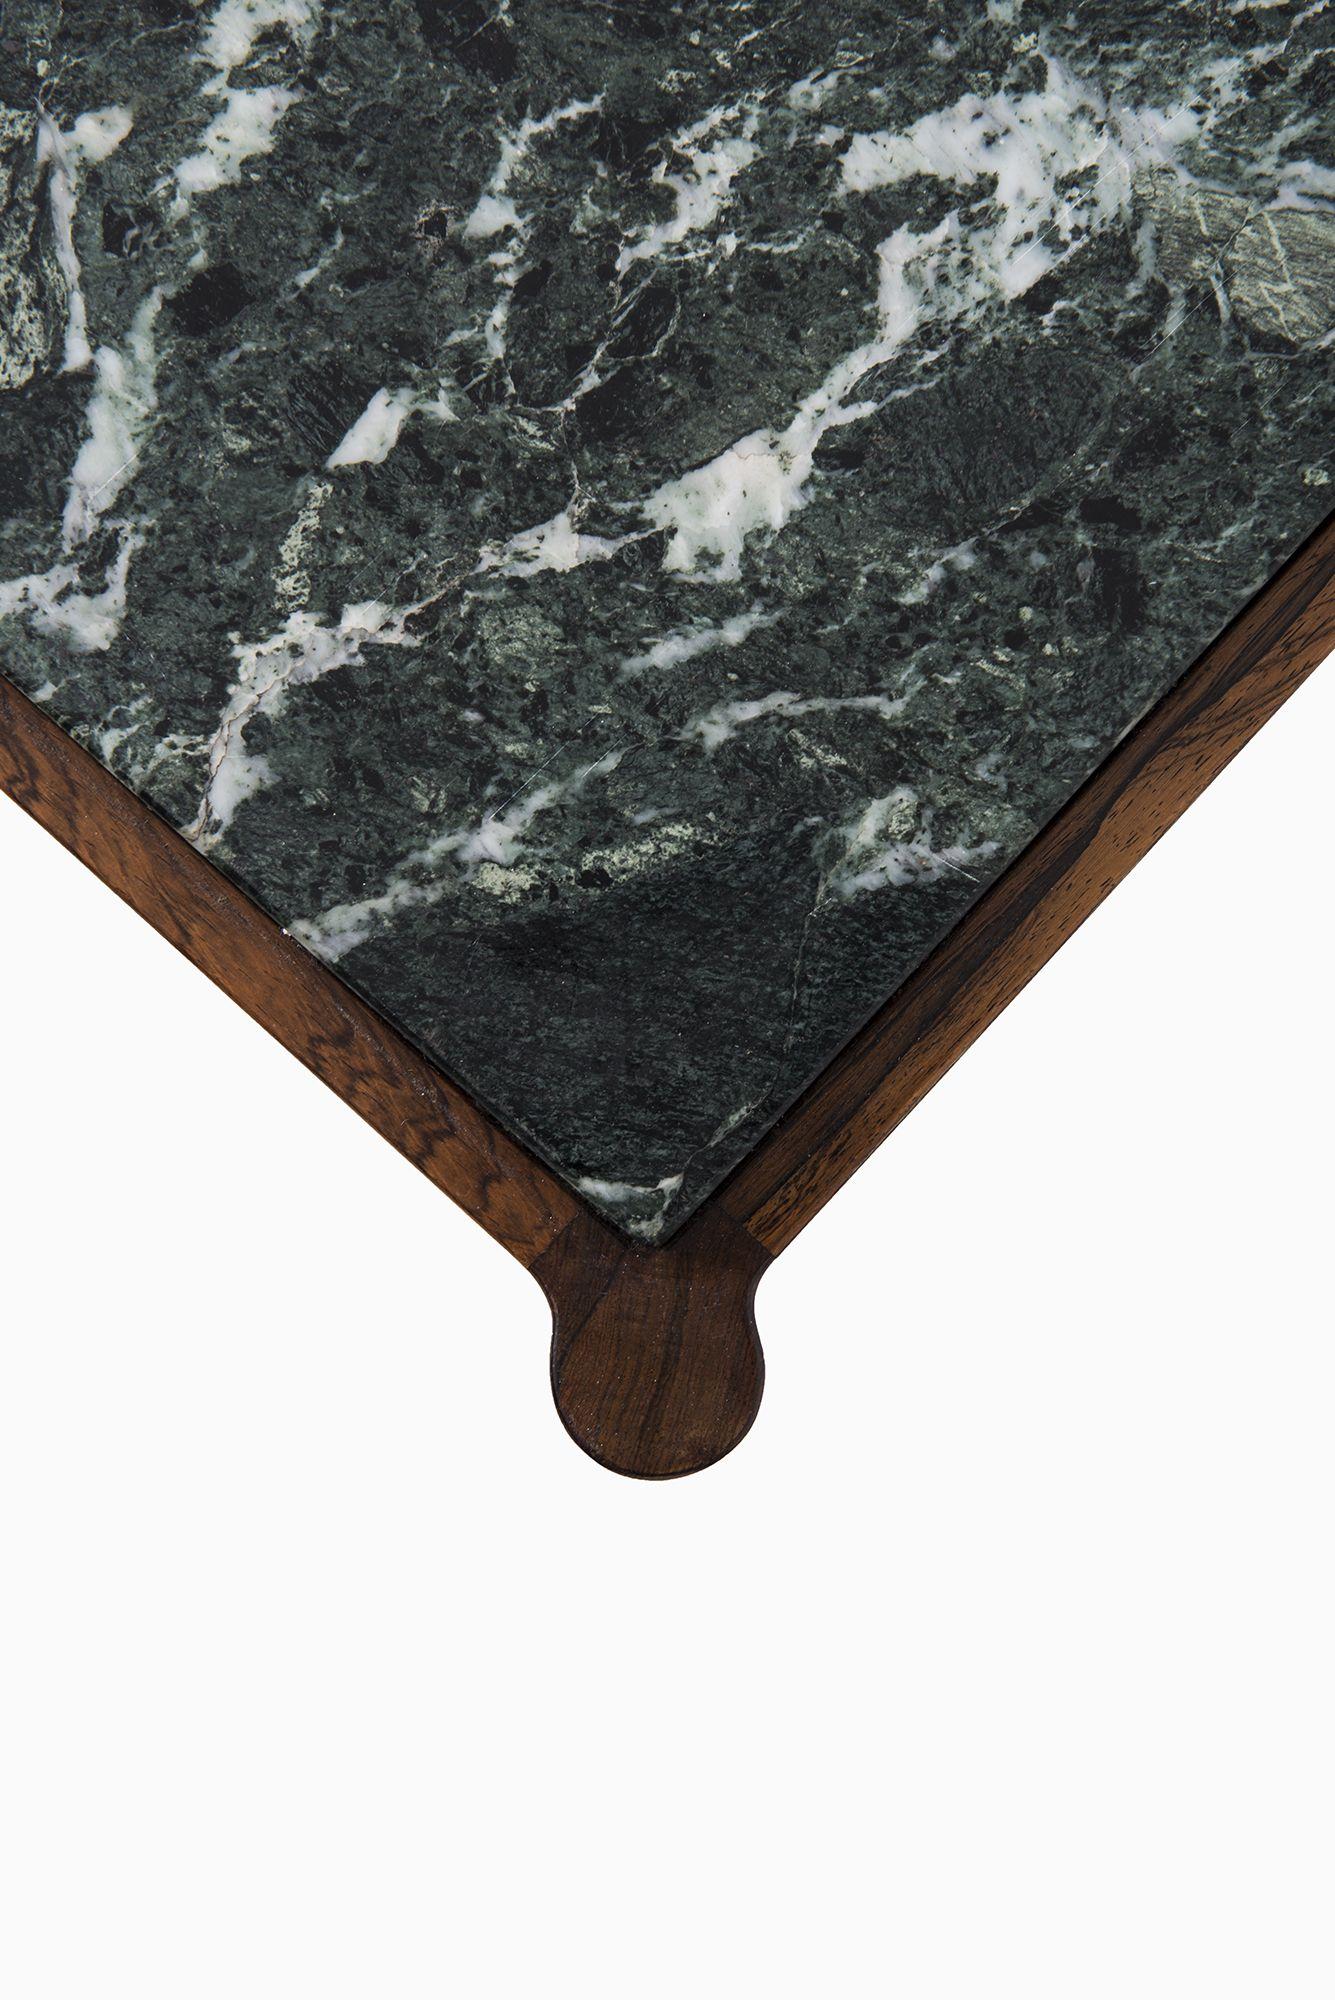 Ib Kofod-Larsen coffee table in rosewood & marble at Studio Schalling